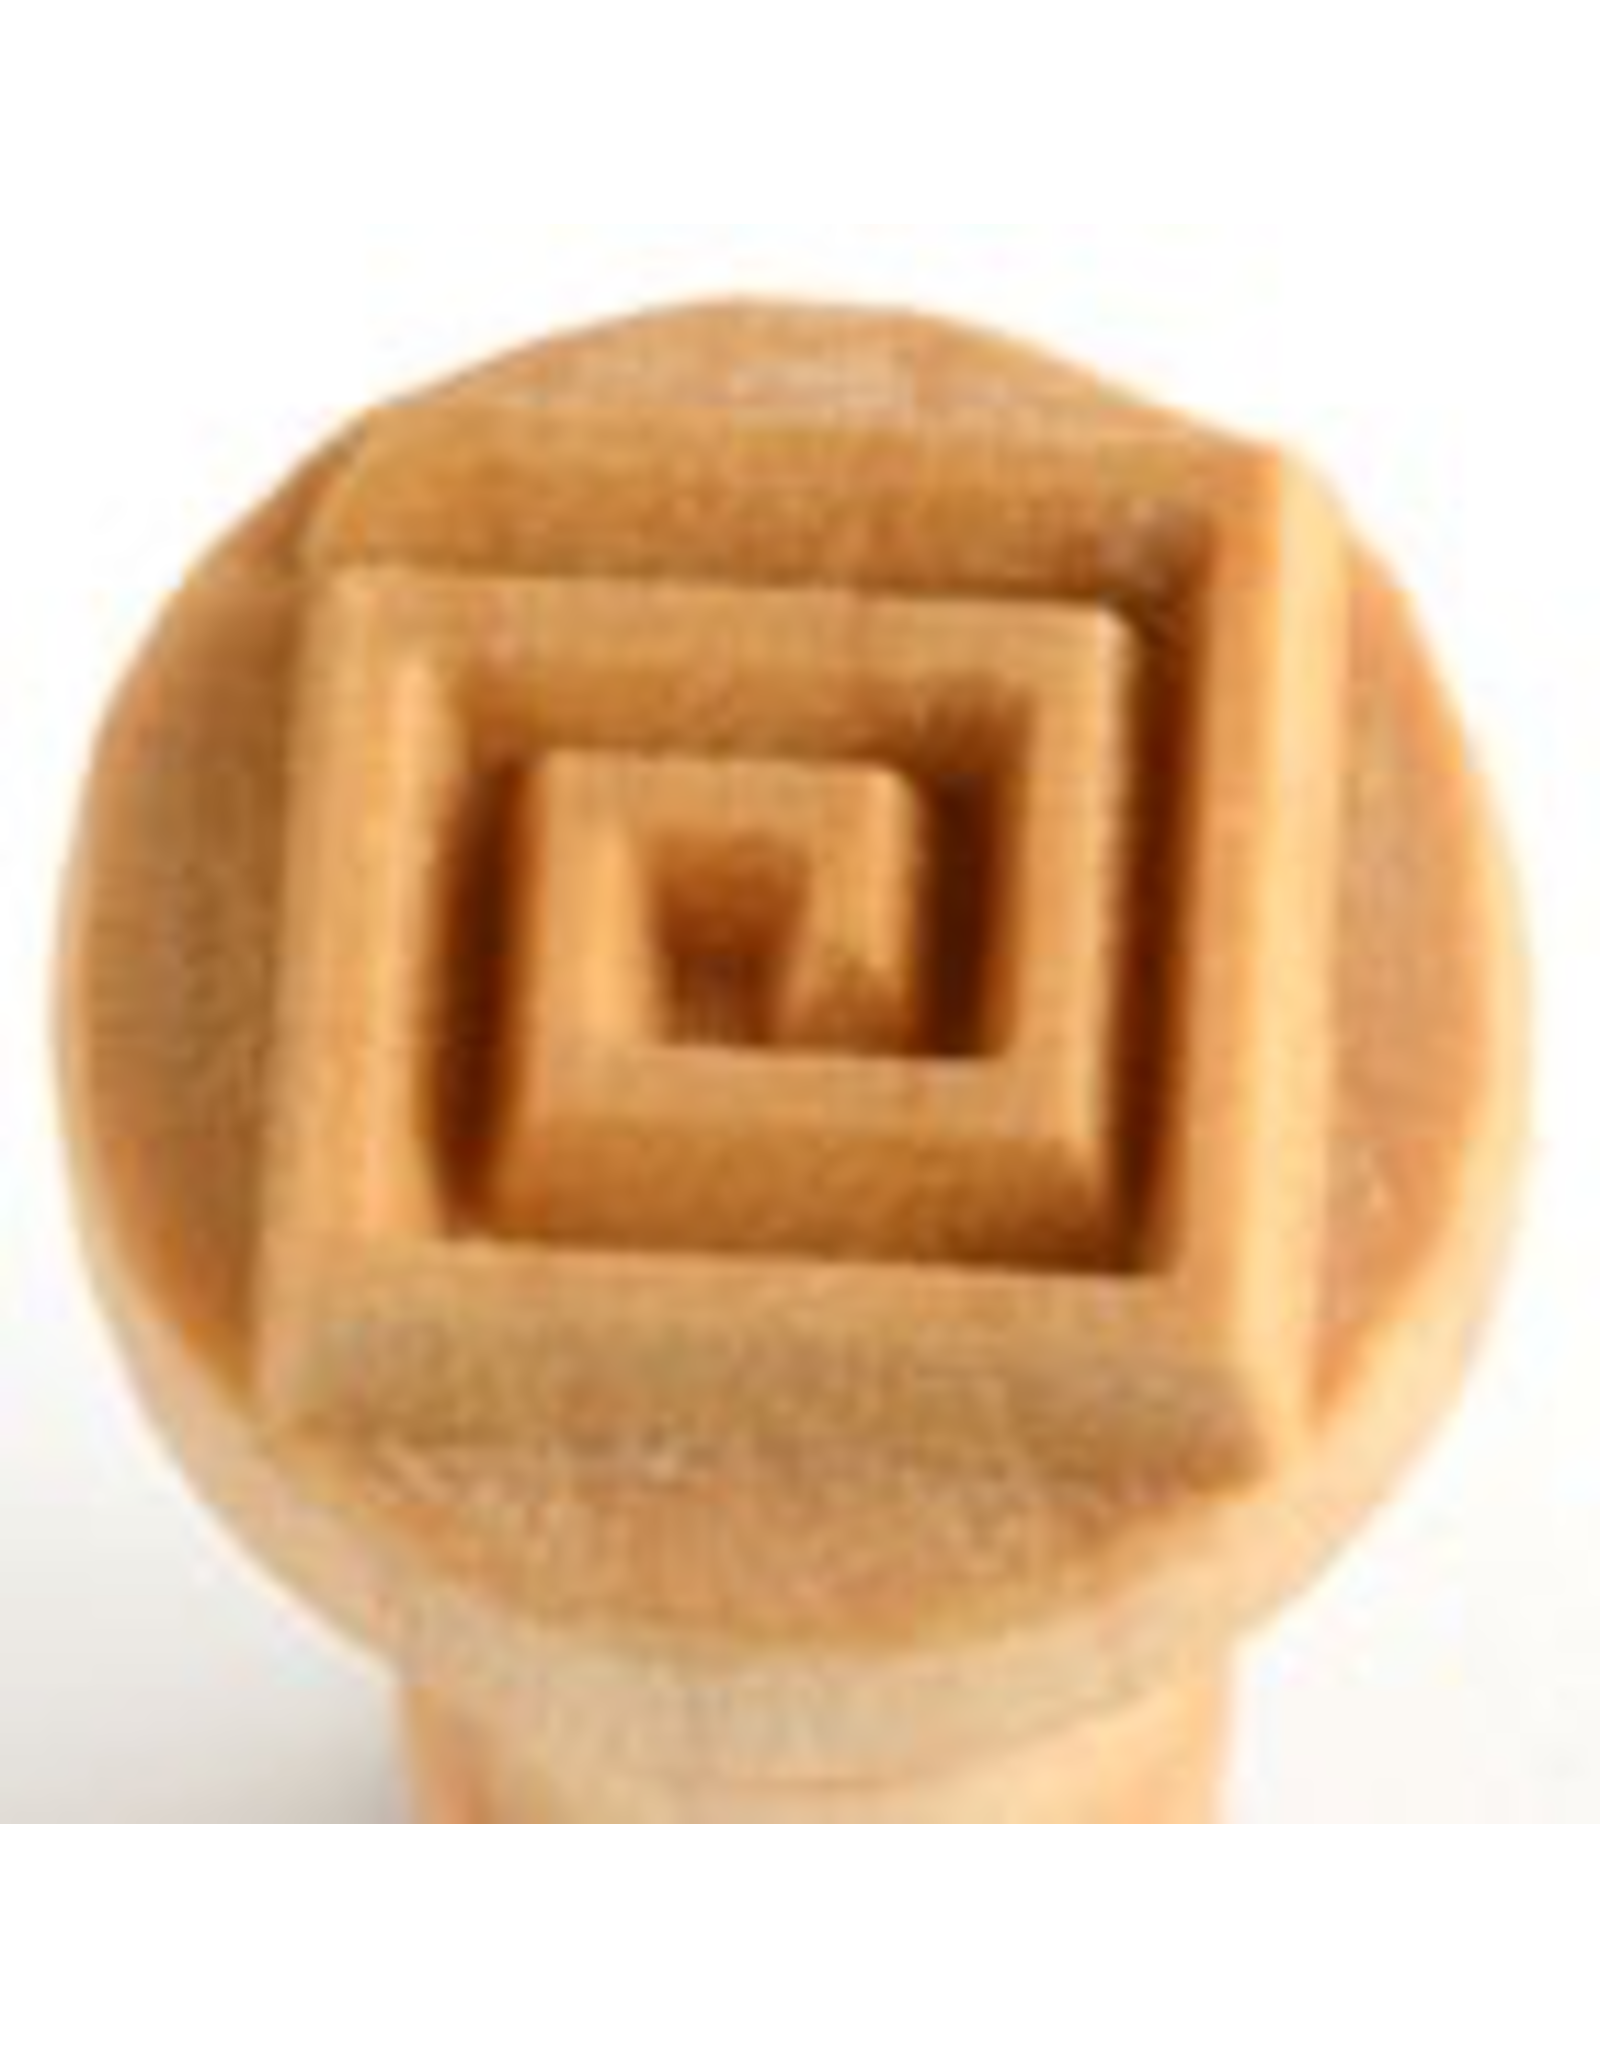 Square Coil stamp (2.5cm)